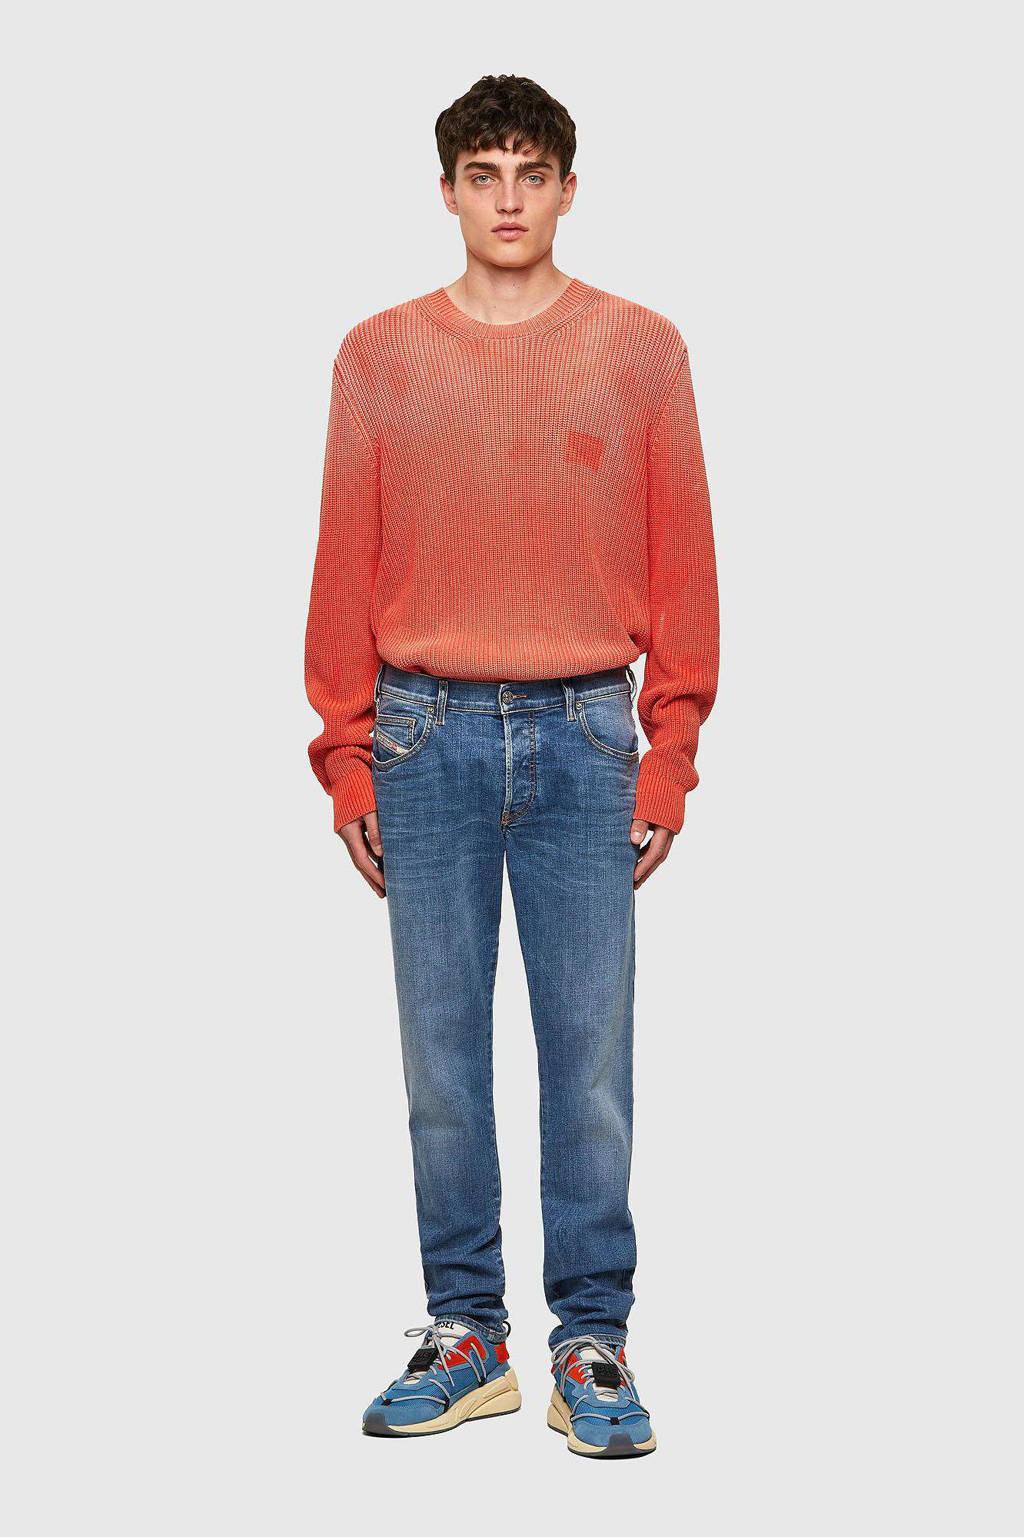 Diesel tapered fit jeans D-YENNOX 01 denim, 01 Denim